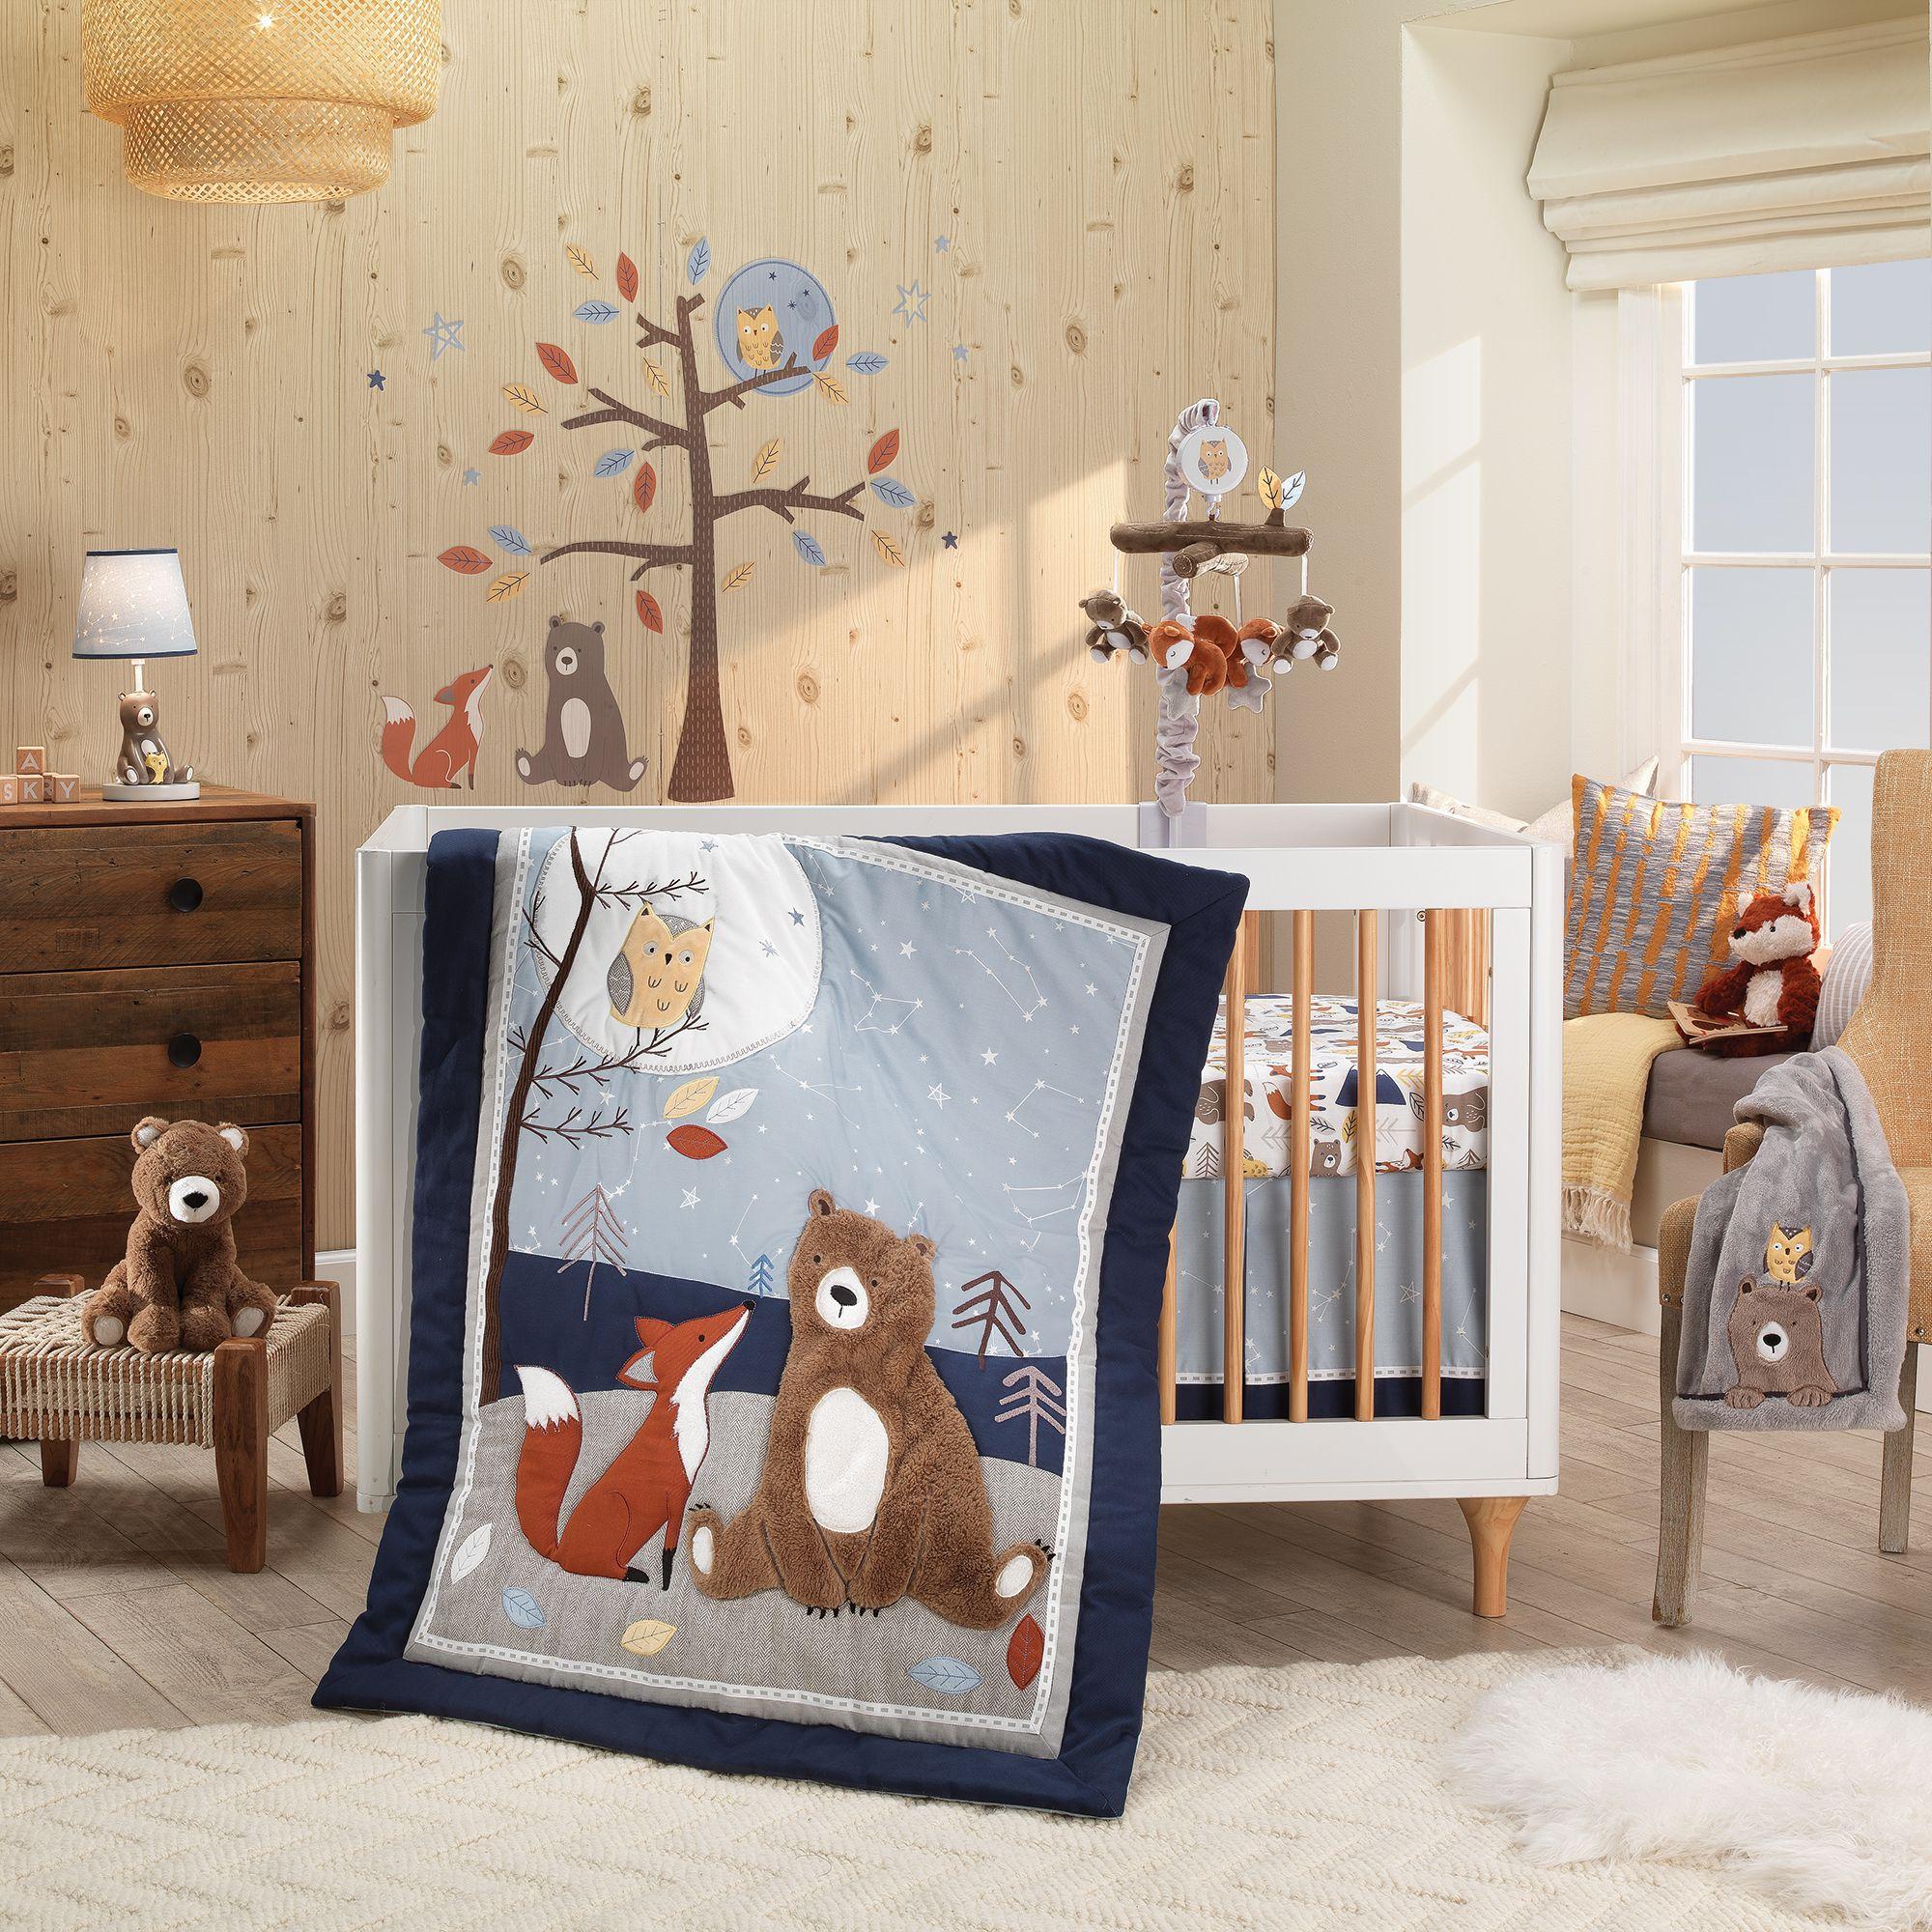 Sierra Sky 3 Piece Crib Bedding Set Baby Crib Bedding Baby Crib Bedding Sets Gray Woodland Nursery